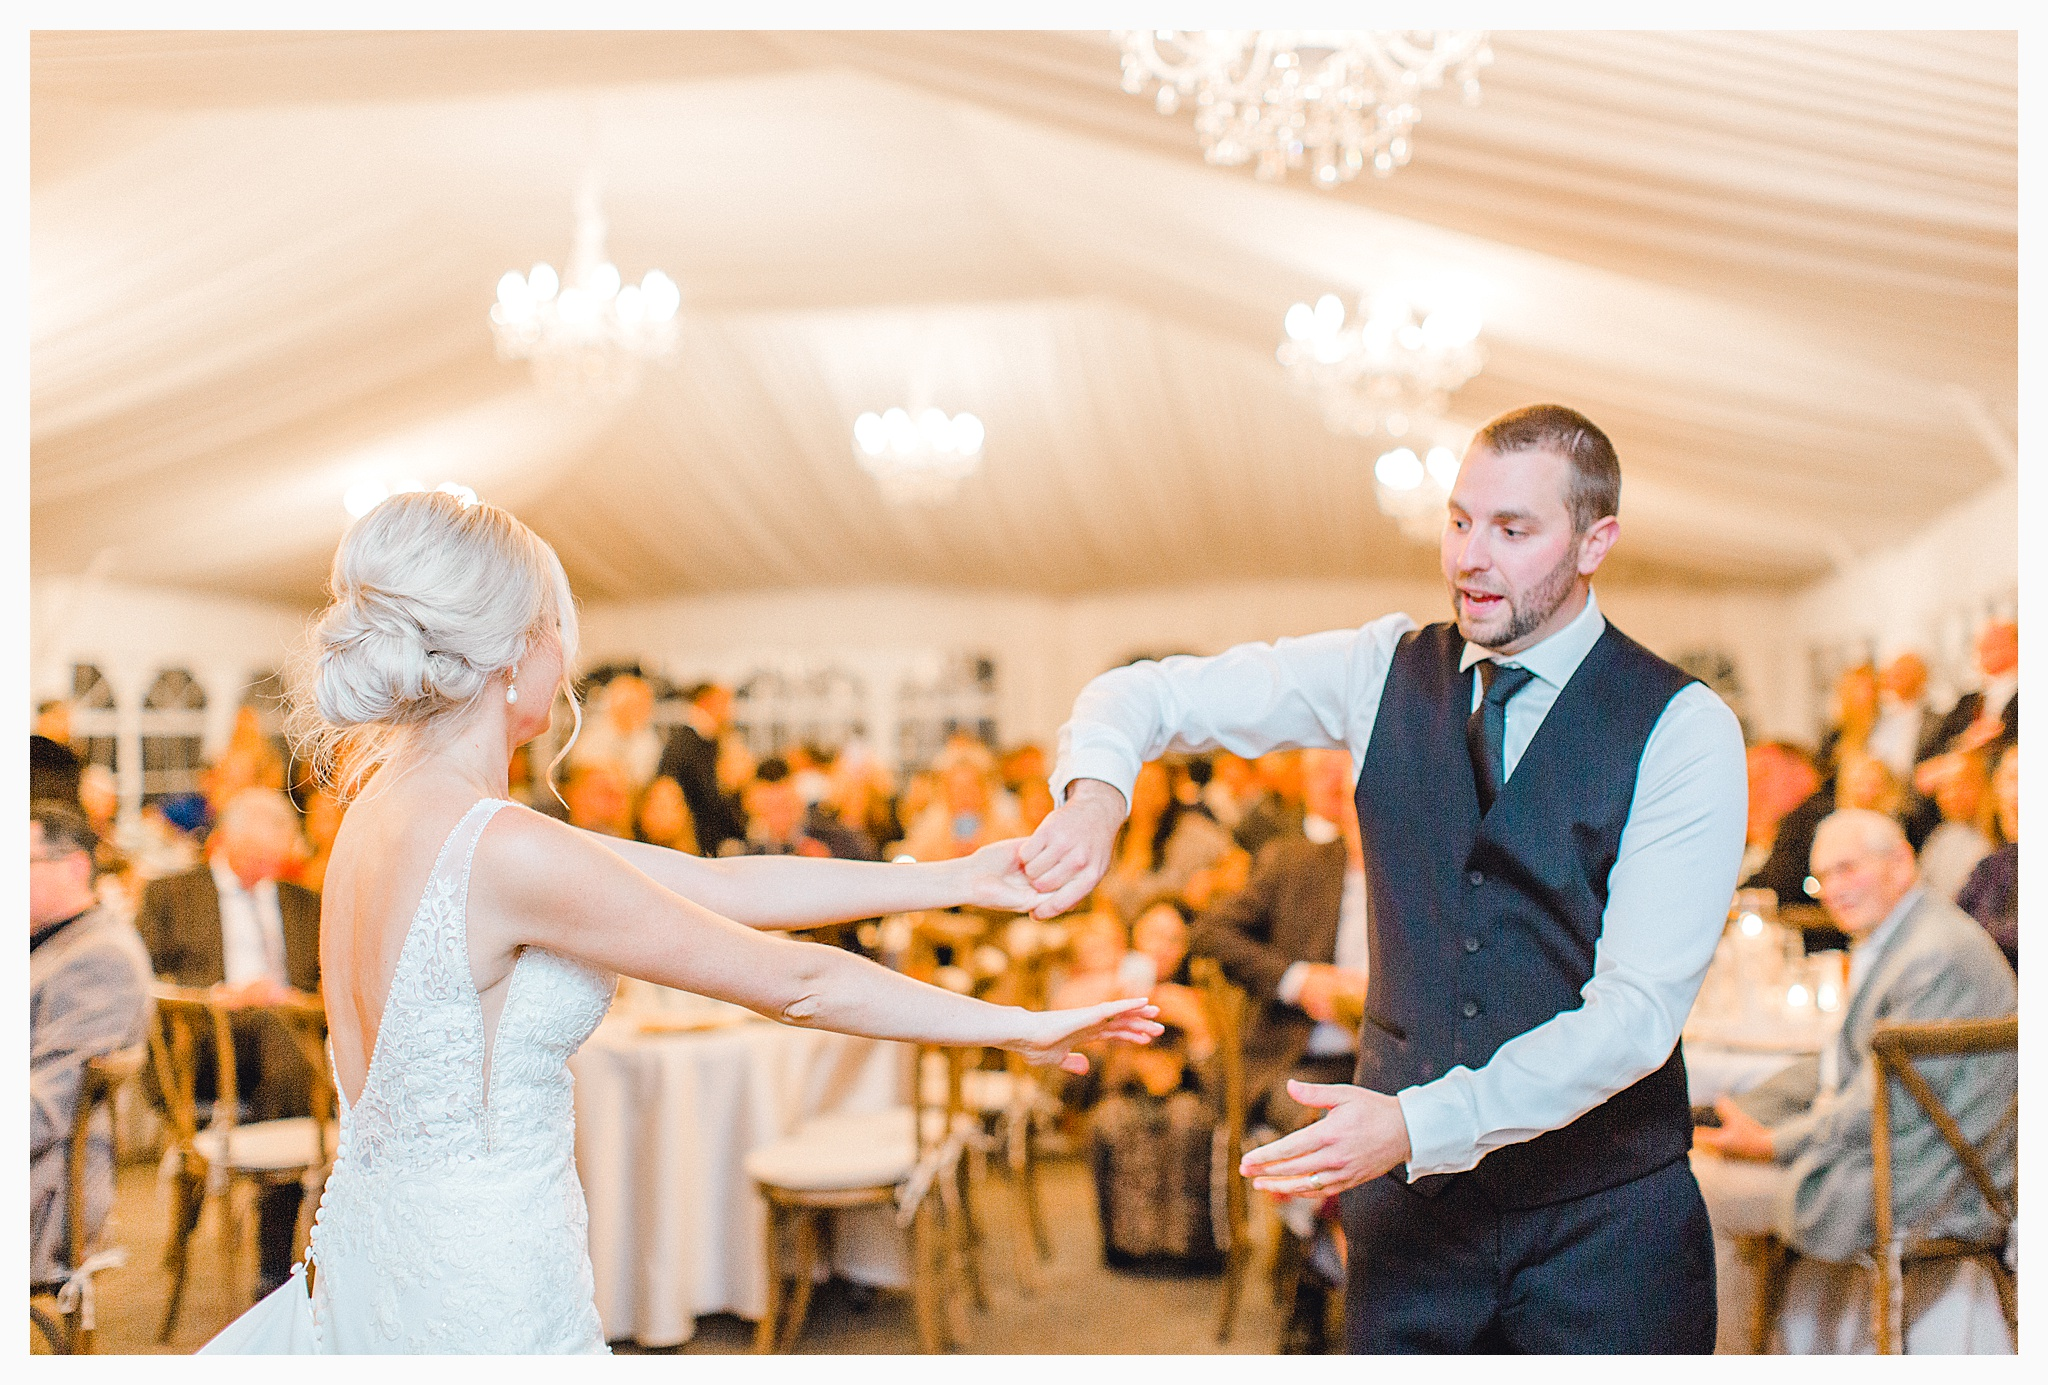 Emma Rose Company Light and Airy Wedding Photographer, Beautiful fall wedding at Rock Creek Gardens Venue in Puyallup, Washington._0106.jpg